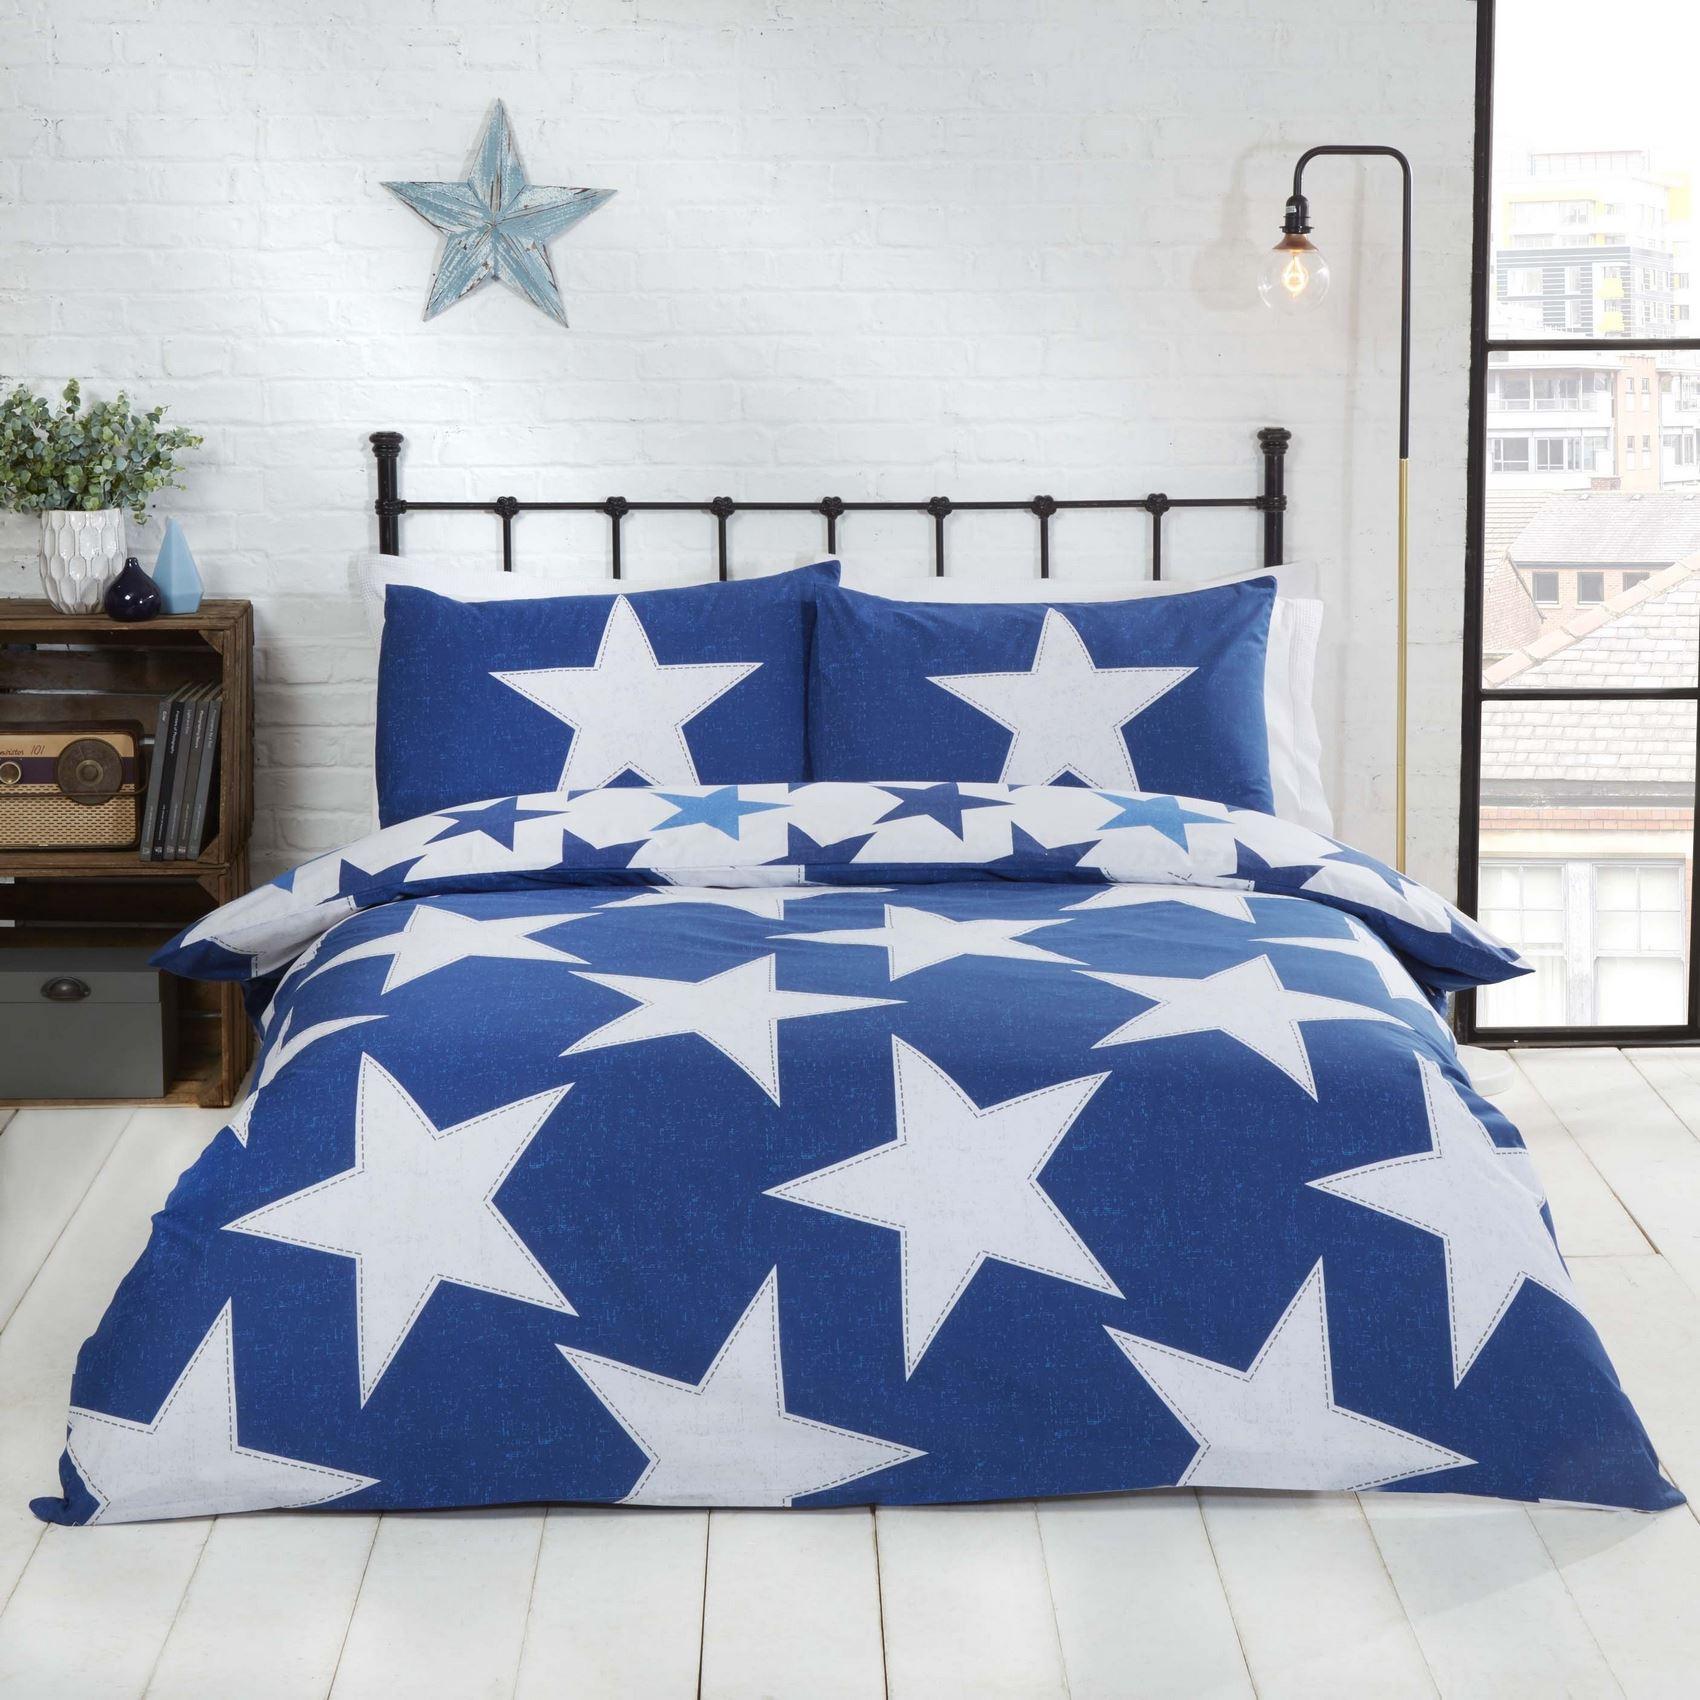 Quilt-Duvet-Cover-amp-Pillowcase-Bedding-Bed-Sets-Teenagers-Fun-Modern-Designs